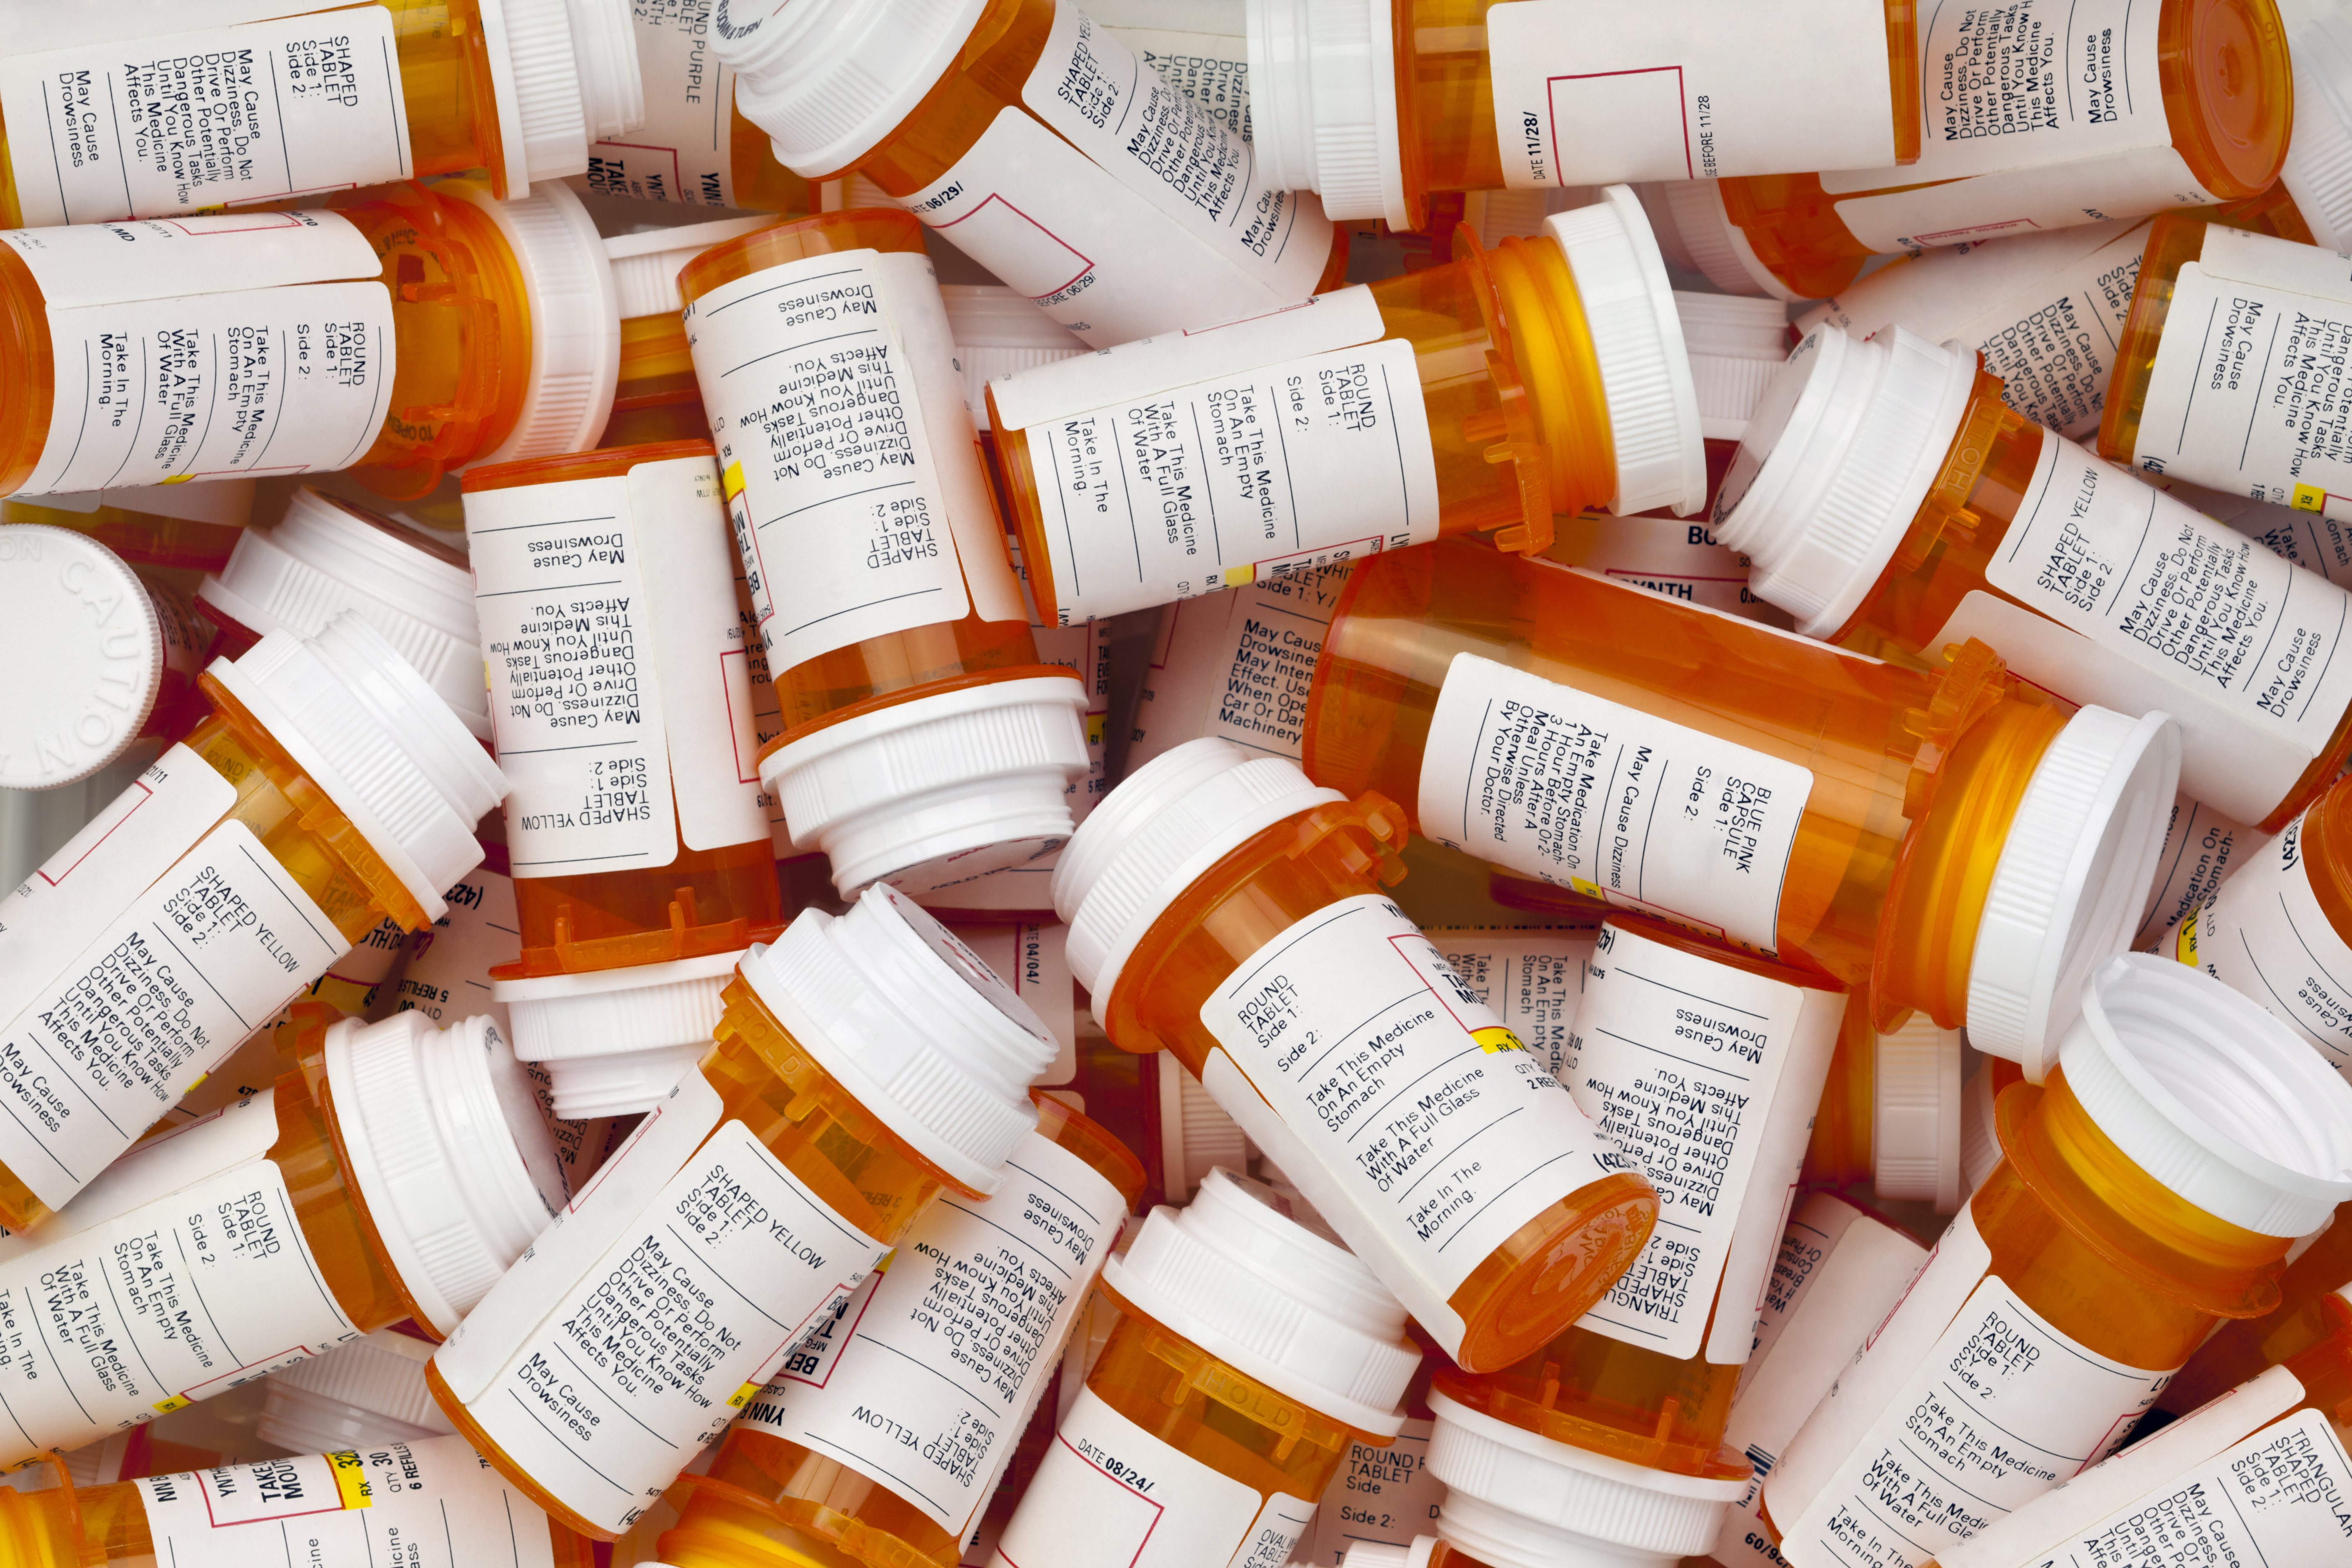 Prescription bottles are in a jumble. Shutterstock image via David Smart